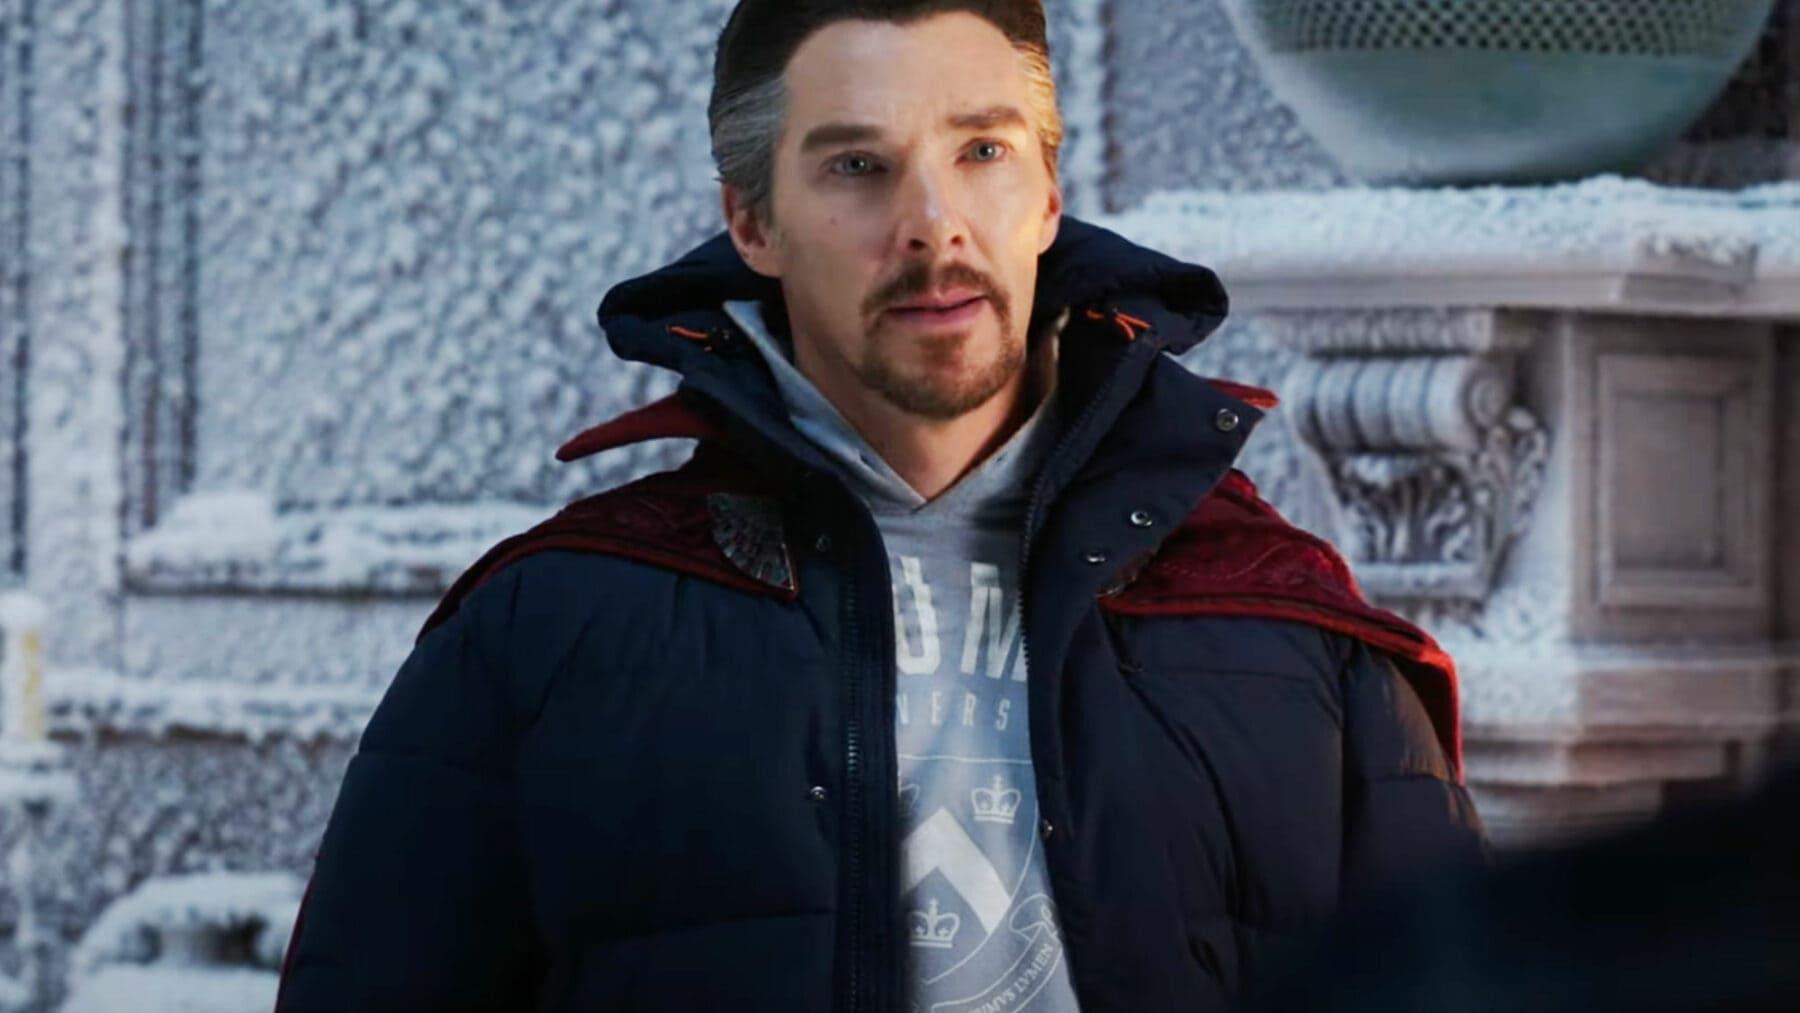 Spider-Man-Benedict-Cumberbatch-Doctor-Strange-No-Way-Home